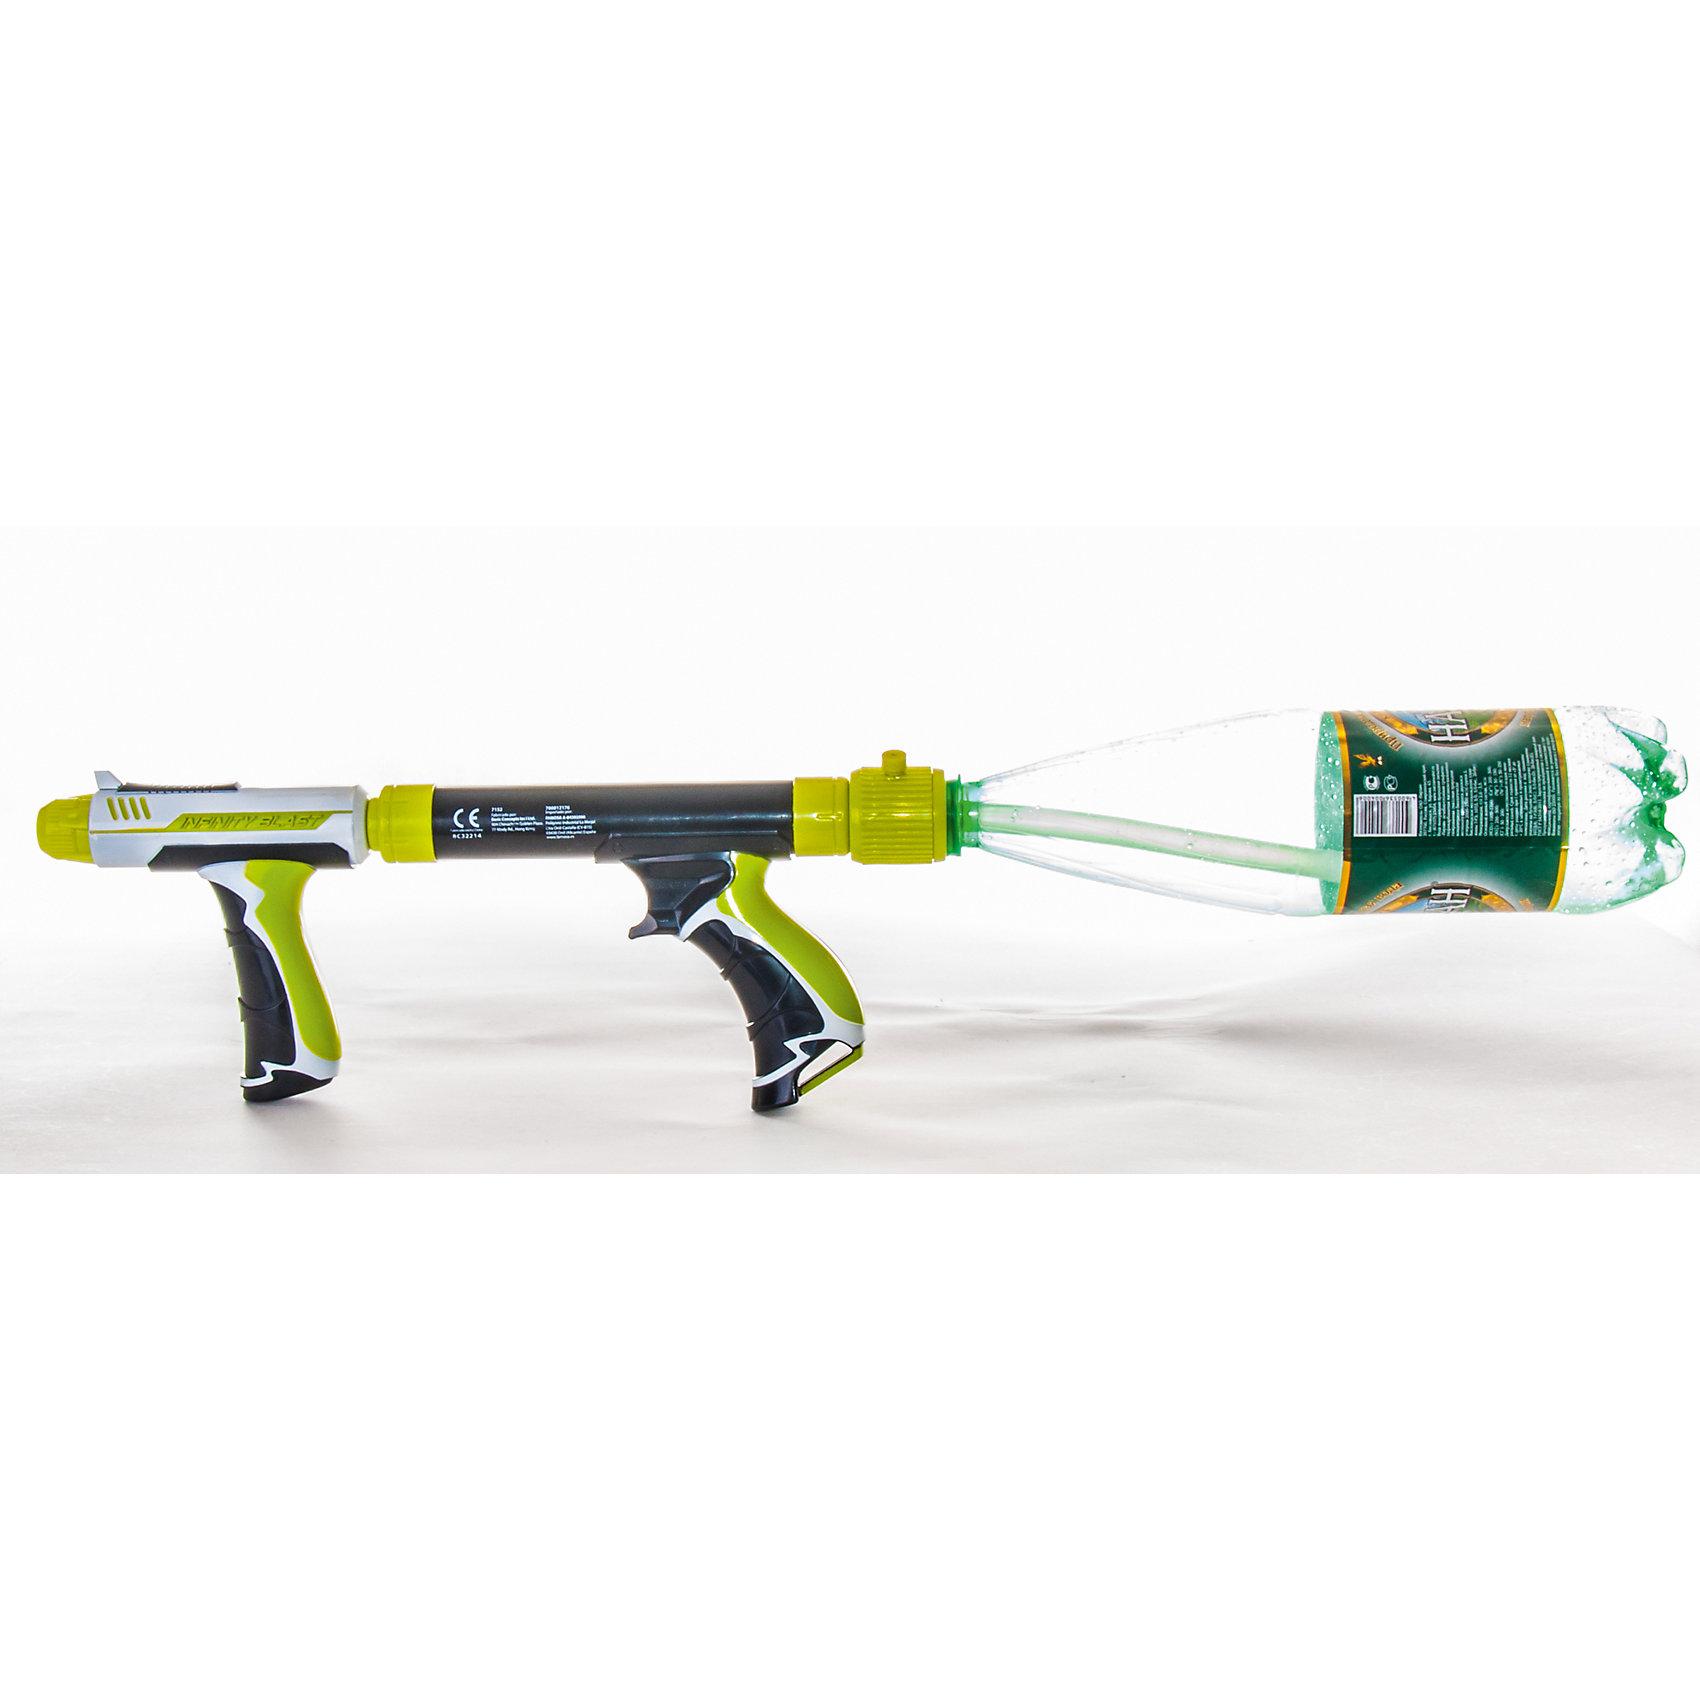 - Водное оружие со съемным резервуаром Infinity Blast, HYDRO FORCE водное оружие hydro force side winder с картриджем на 300 мл